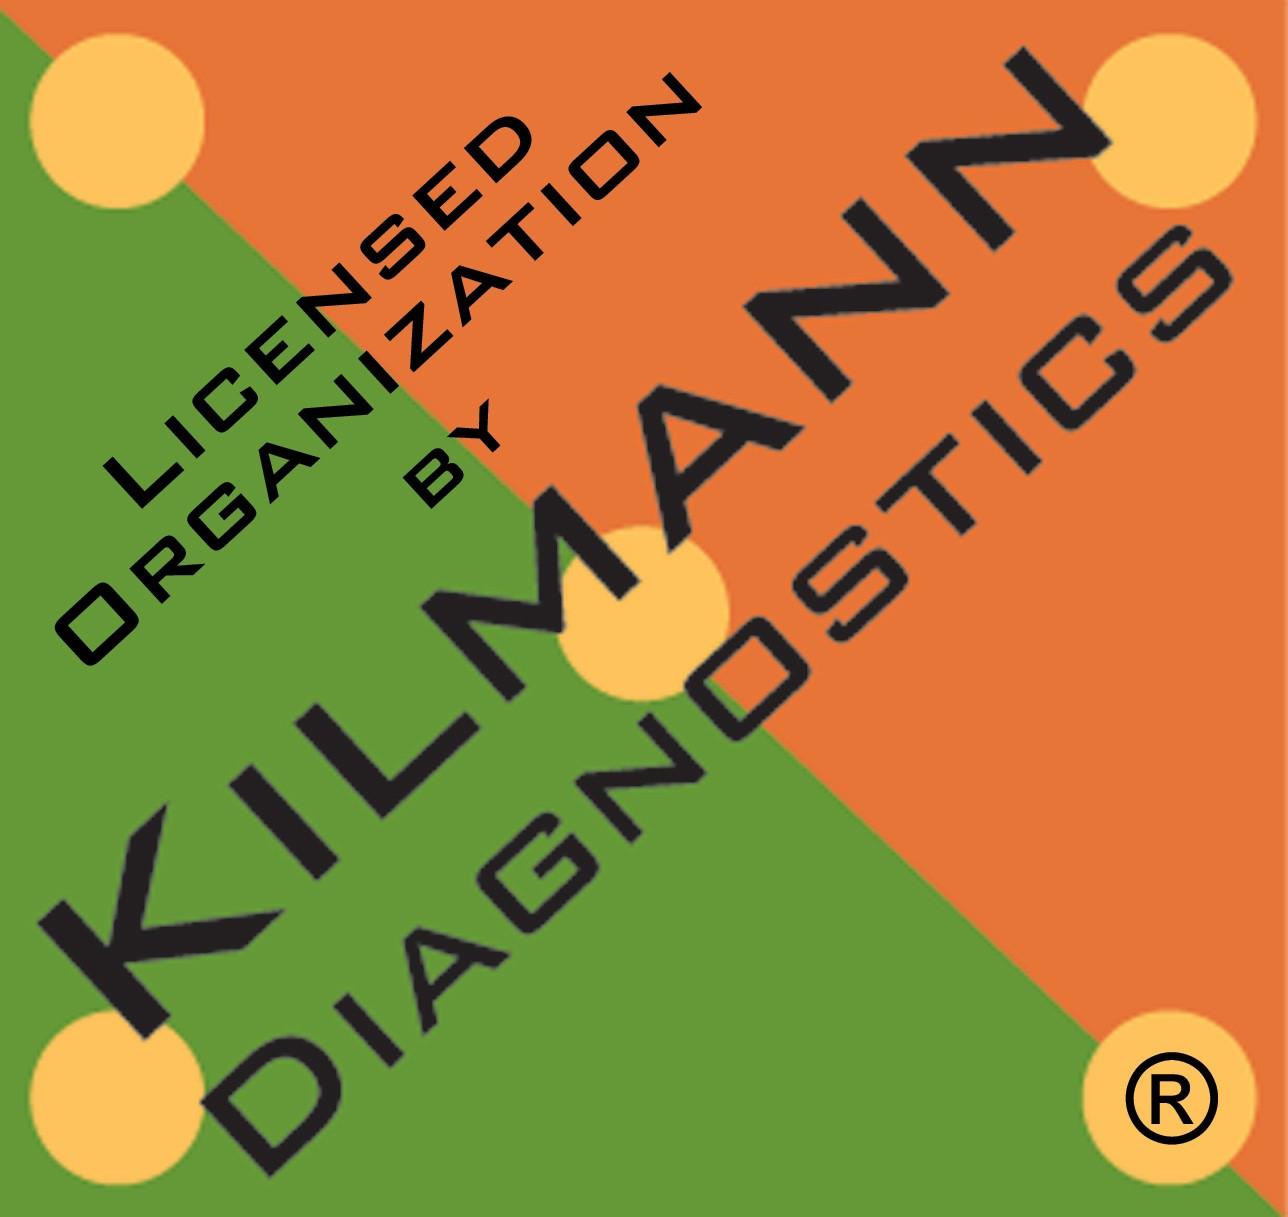 TKI, Innermetrix, Thomas Kilmann Instrument, Conflict, Management